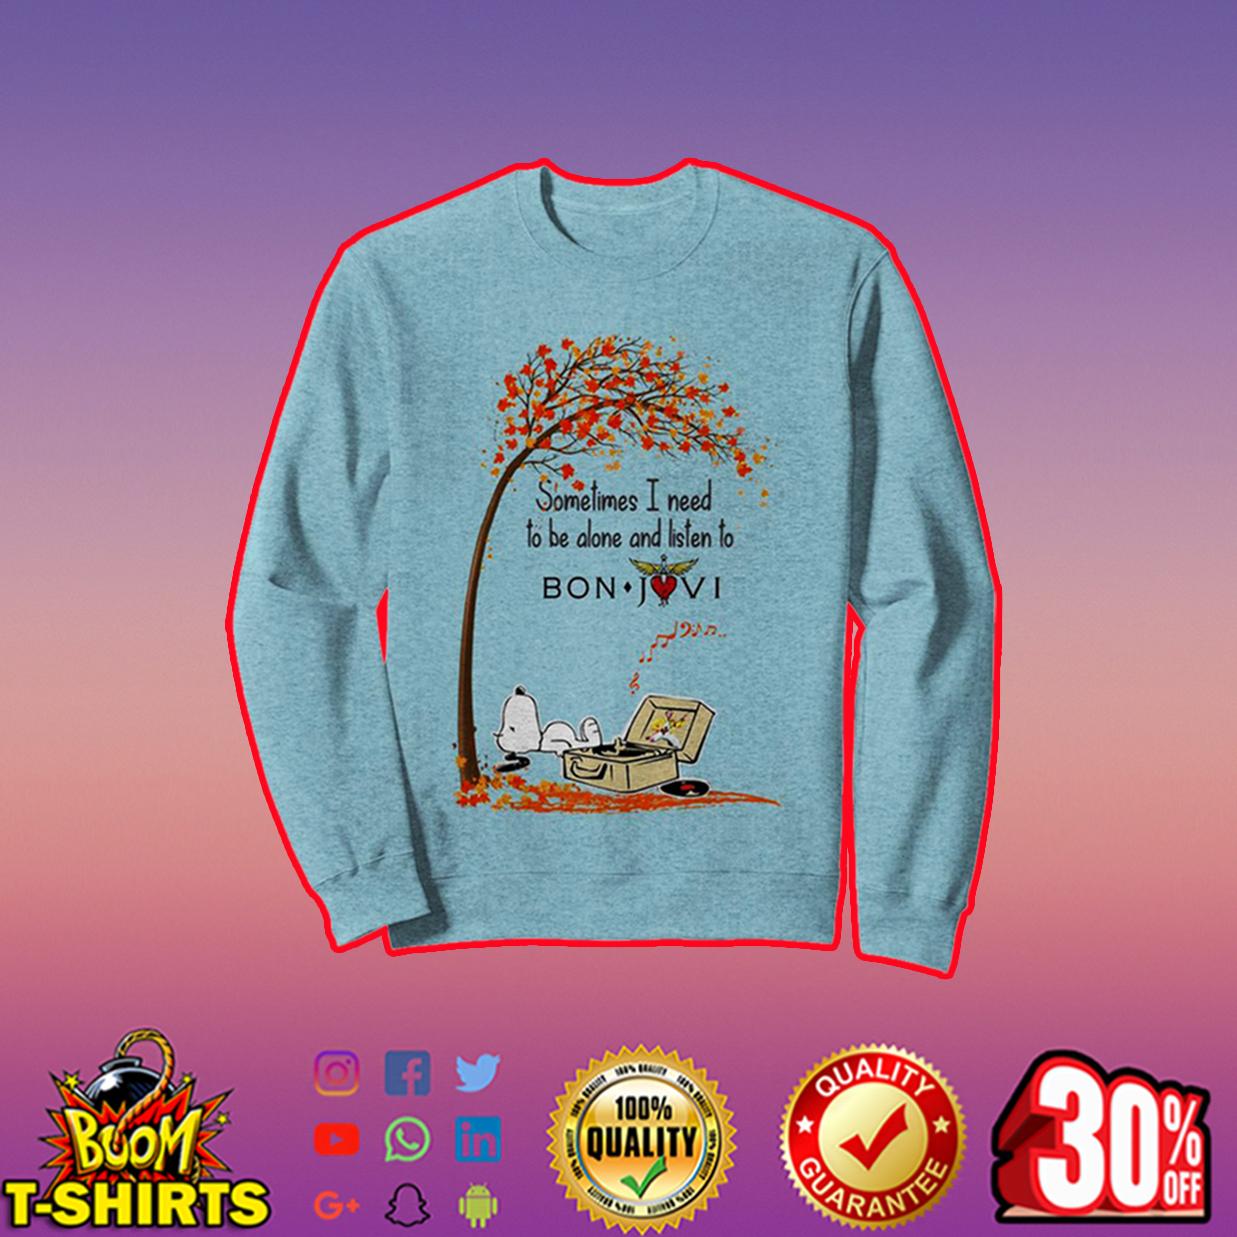 Snoopy Sometimes i need to be alone and listen to Bon Jovi sweatshirt